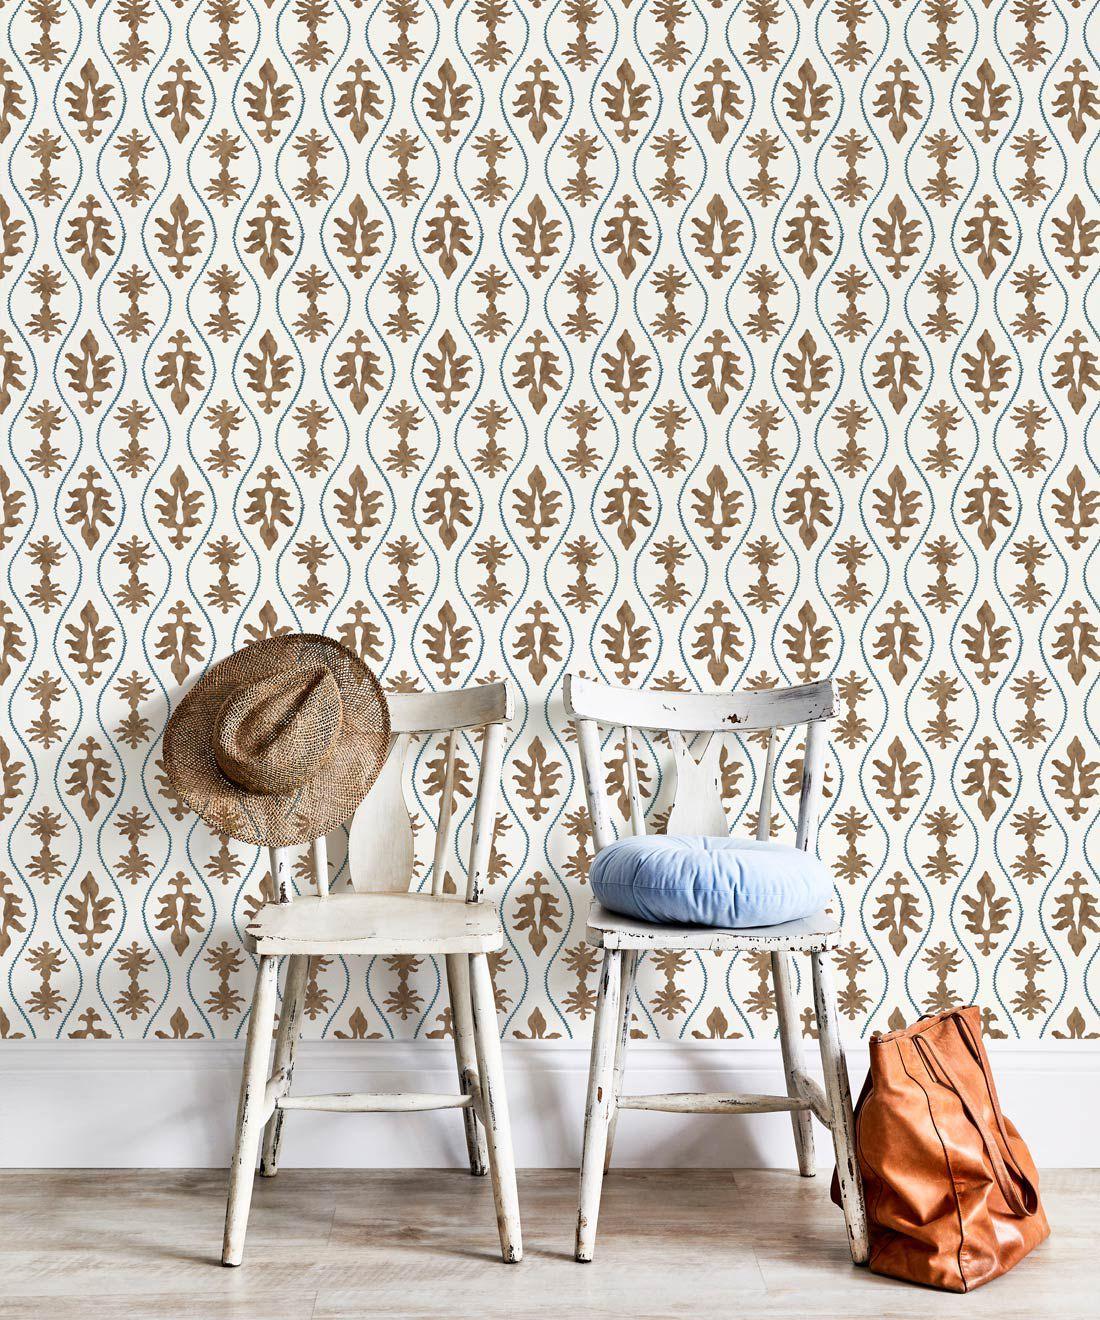 Great Jones Wallpaper • Dianne Bergeron • Chestnut •Insitu